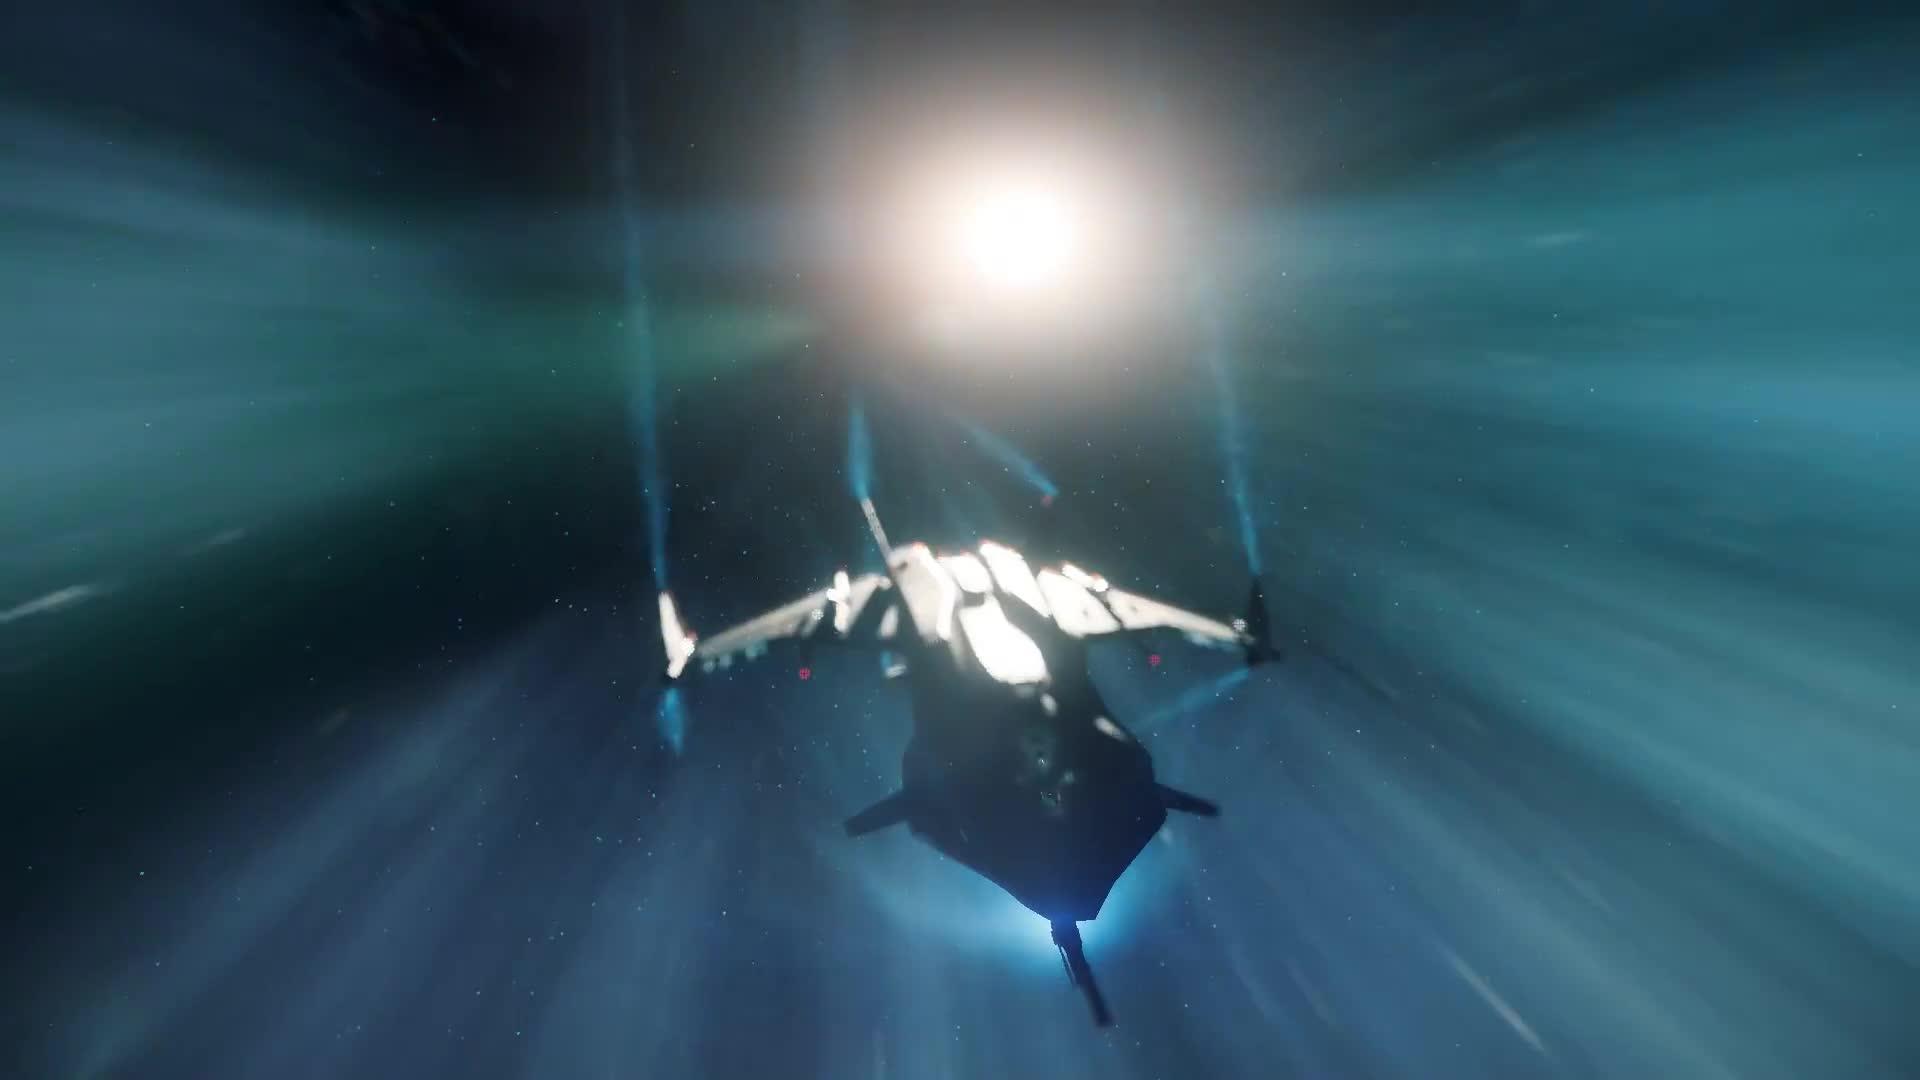 starcitizen, Gladius Valiant Quantum Star Citizen GIFs